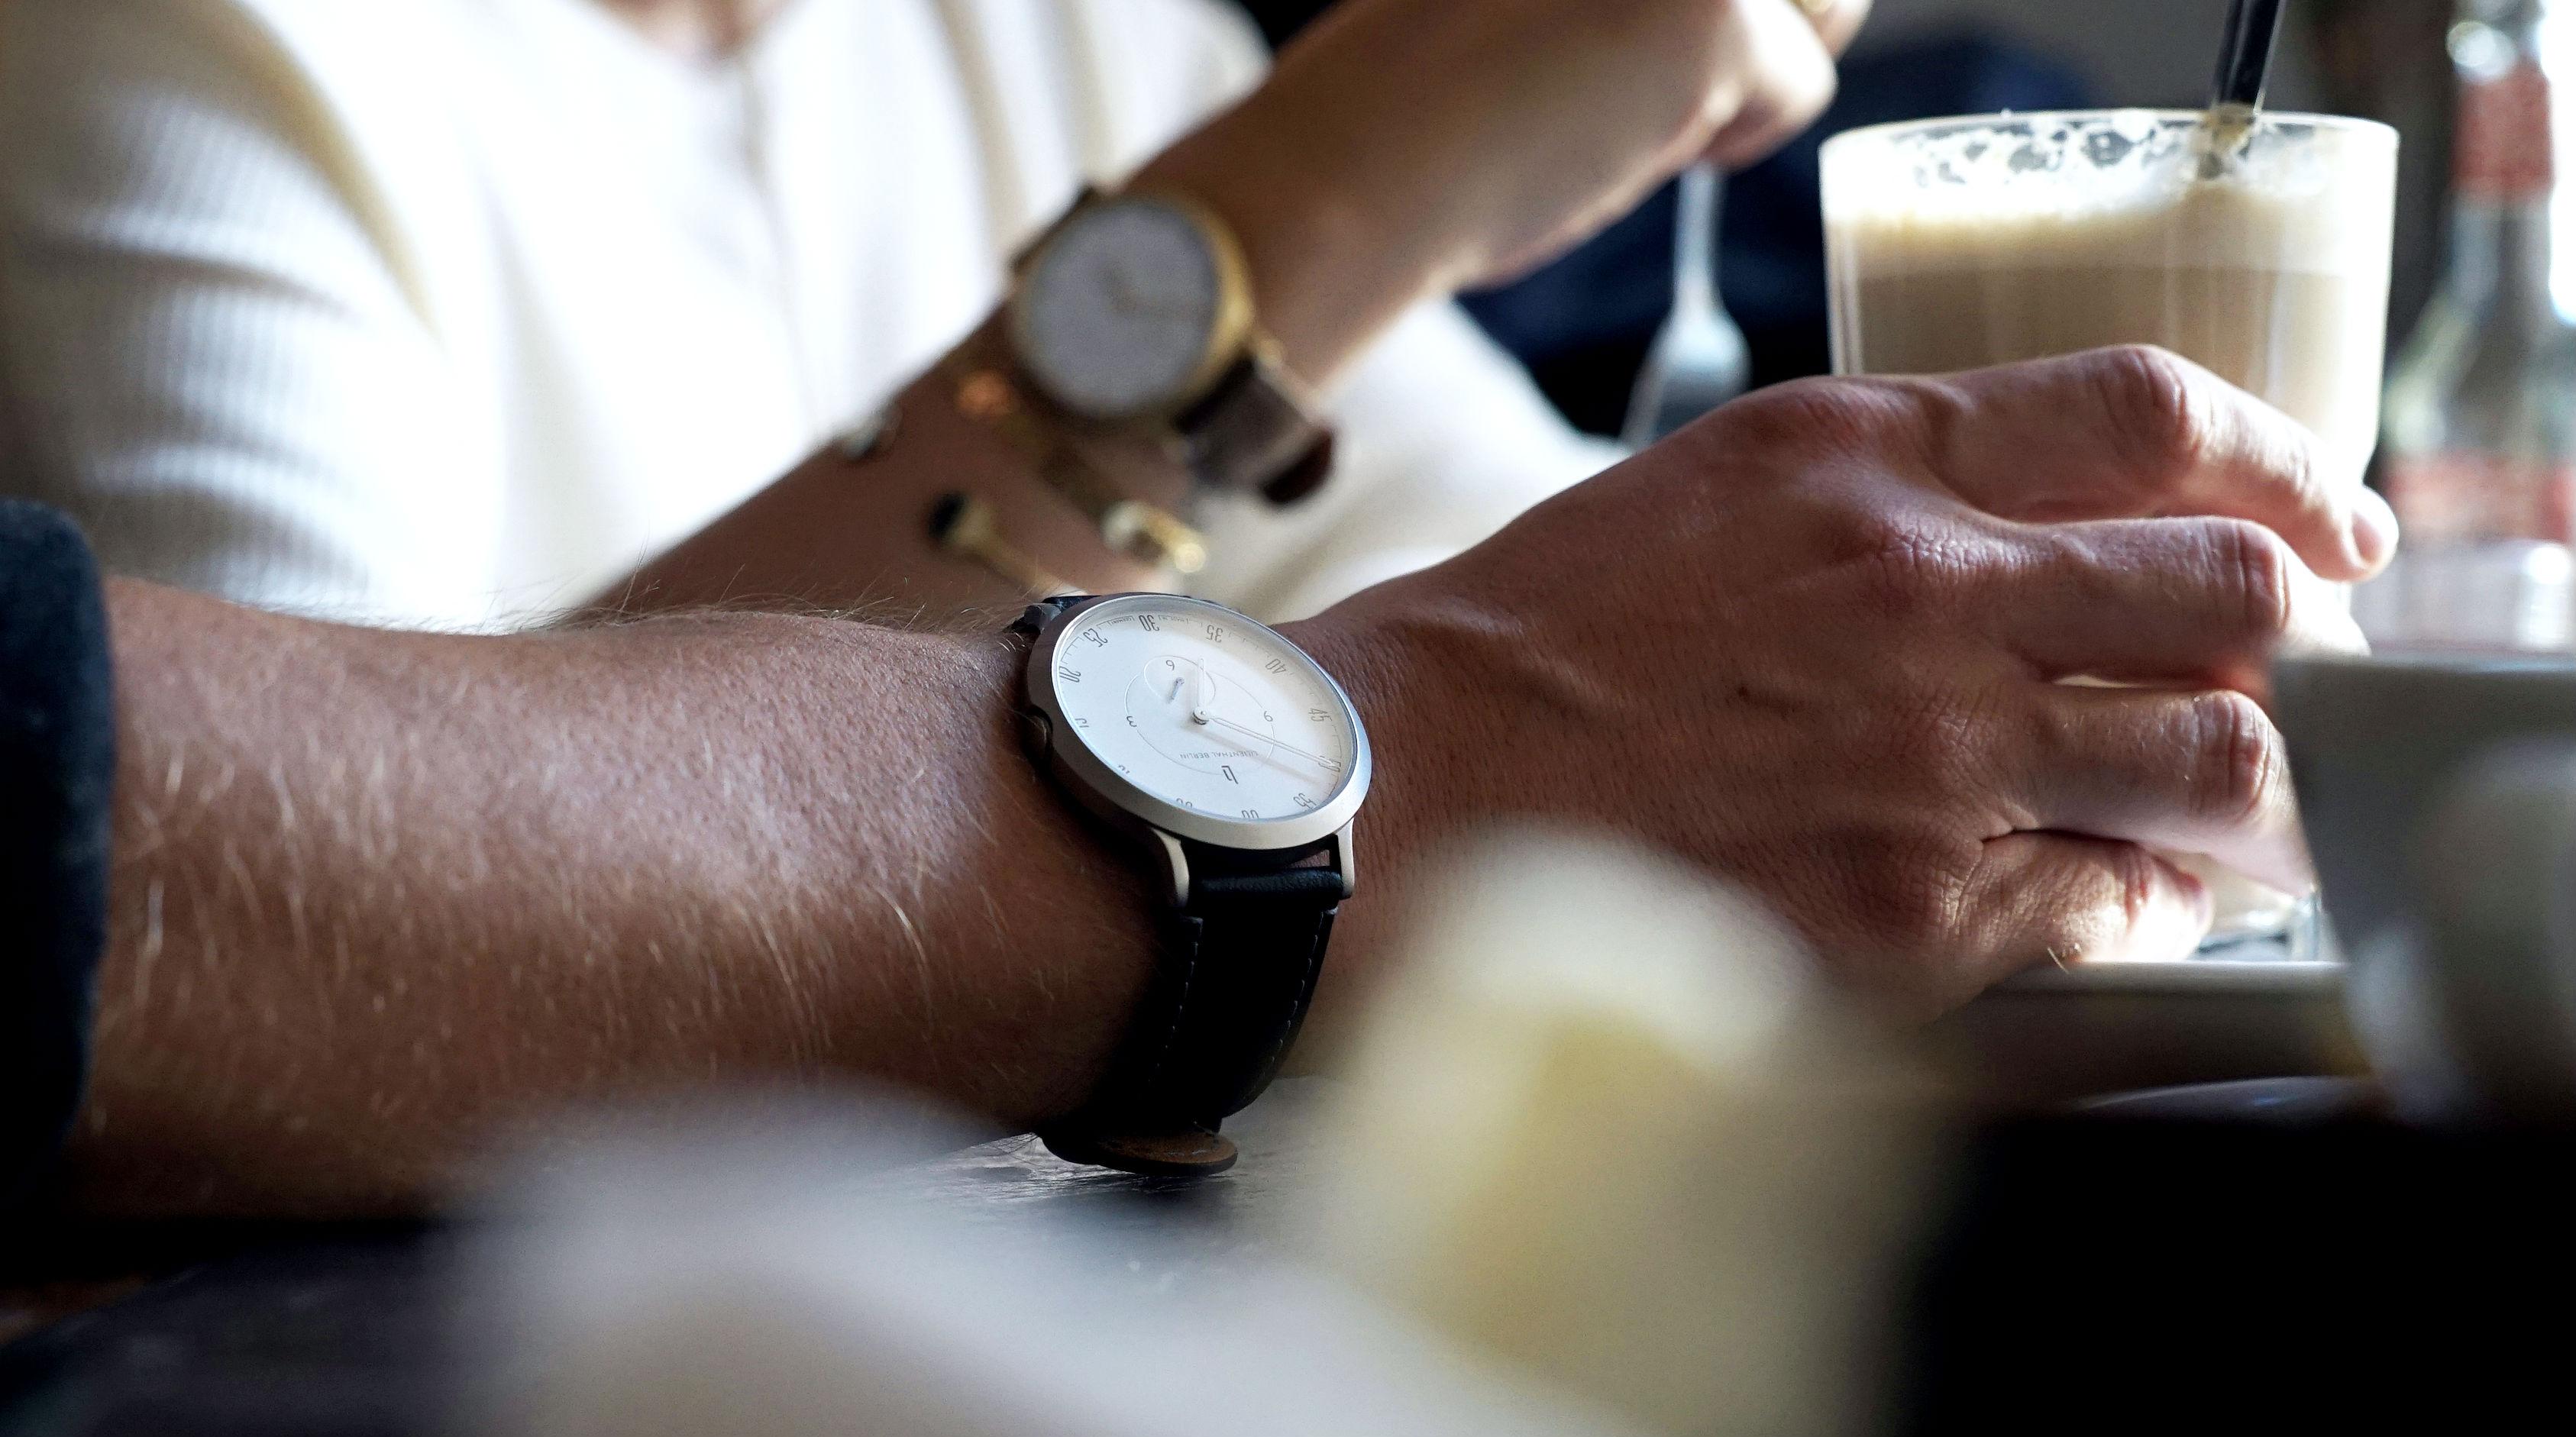 Tommeezjerry-Styleblog-Männerblog-Männer-Modeblog-Berlin-Berlinblog-Männermodeblog-Fashionblog-Cafe-Lilienthal-Uhr-Pilotwatch-Details